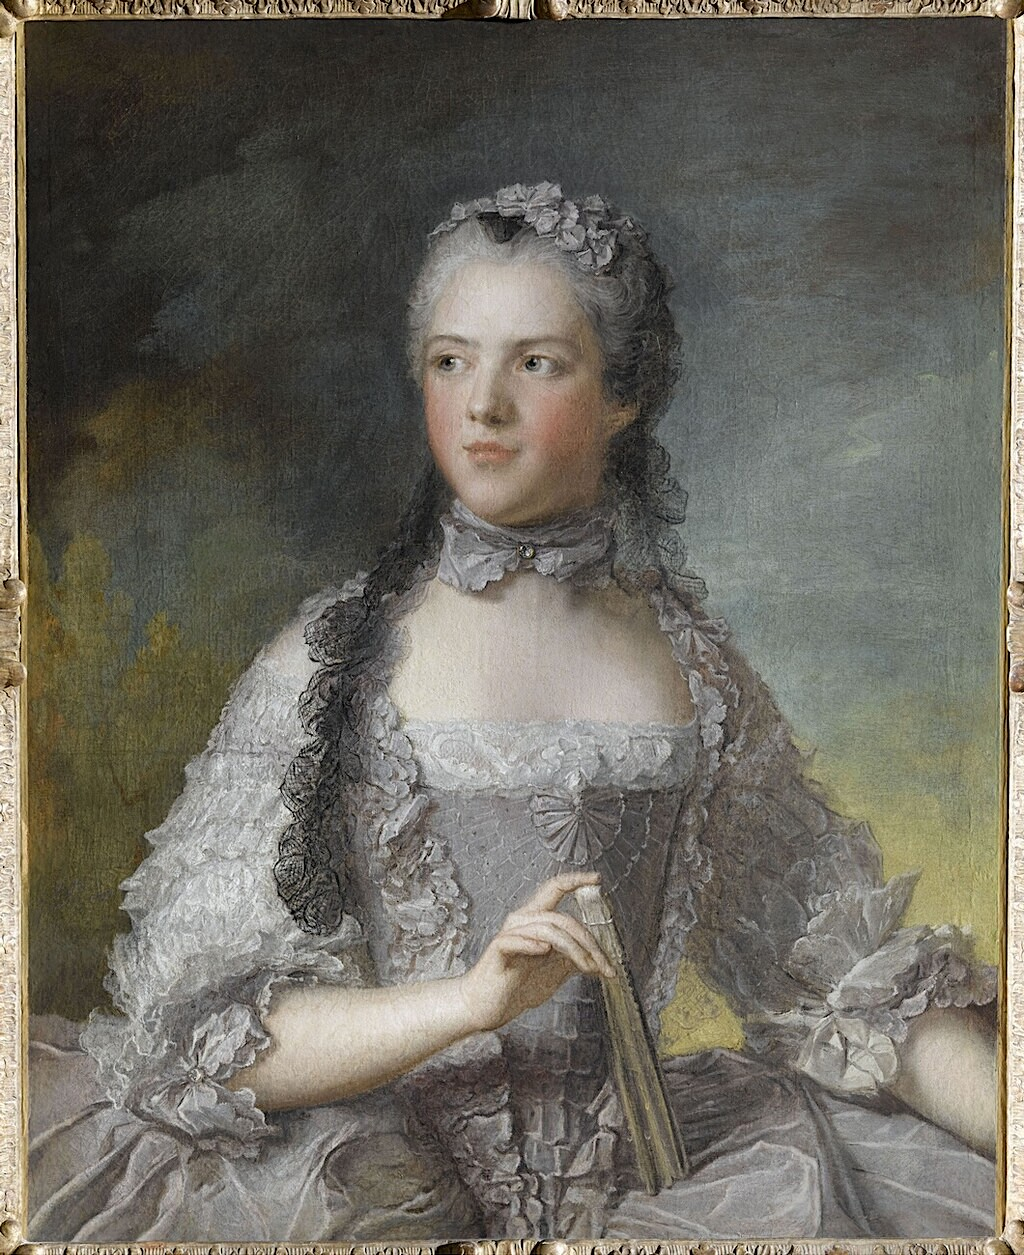 Marie-Adélaïde de France, dite Madame Adélaïde - Page 2 Madame32